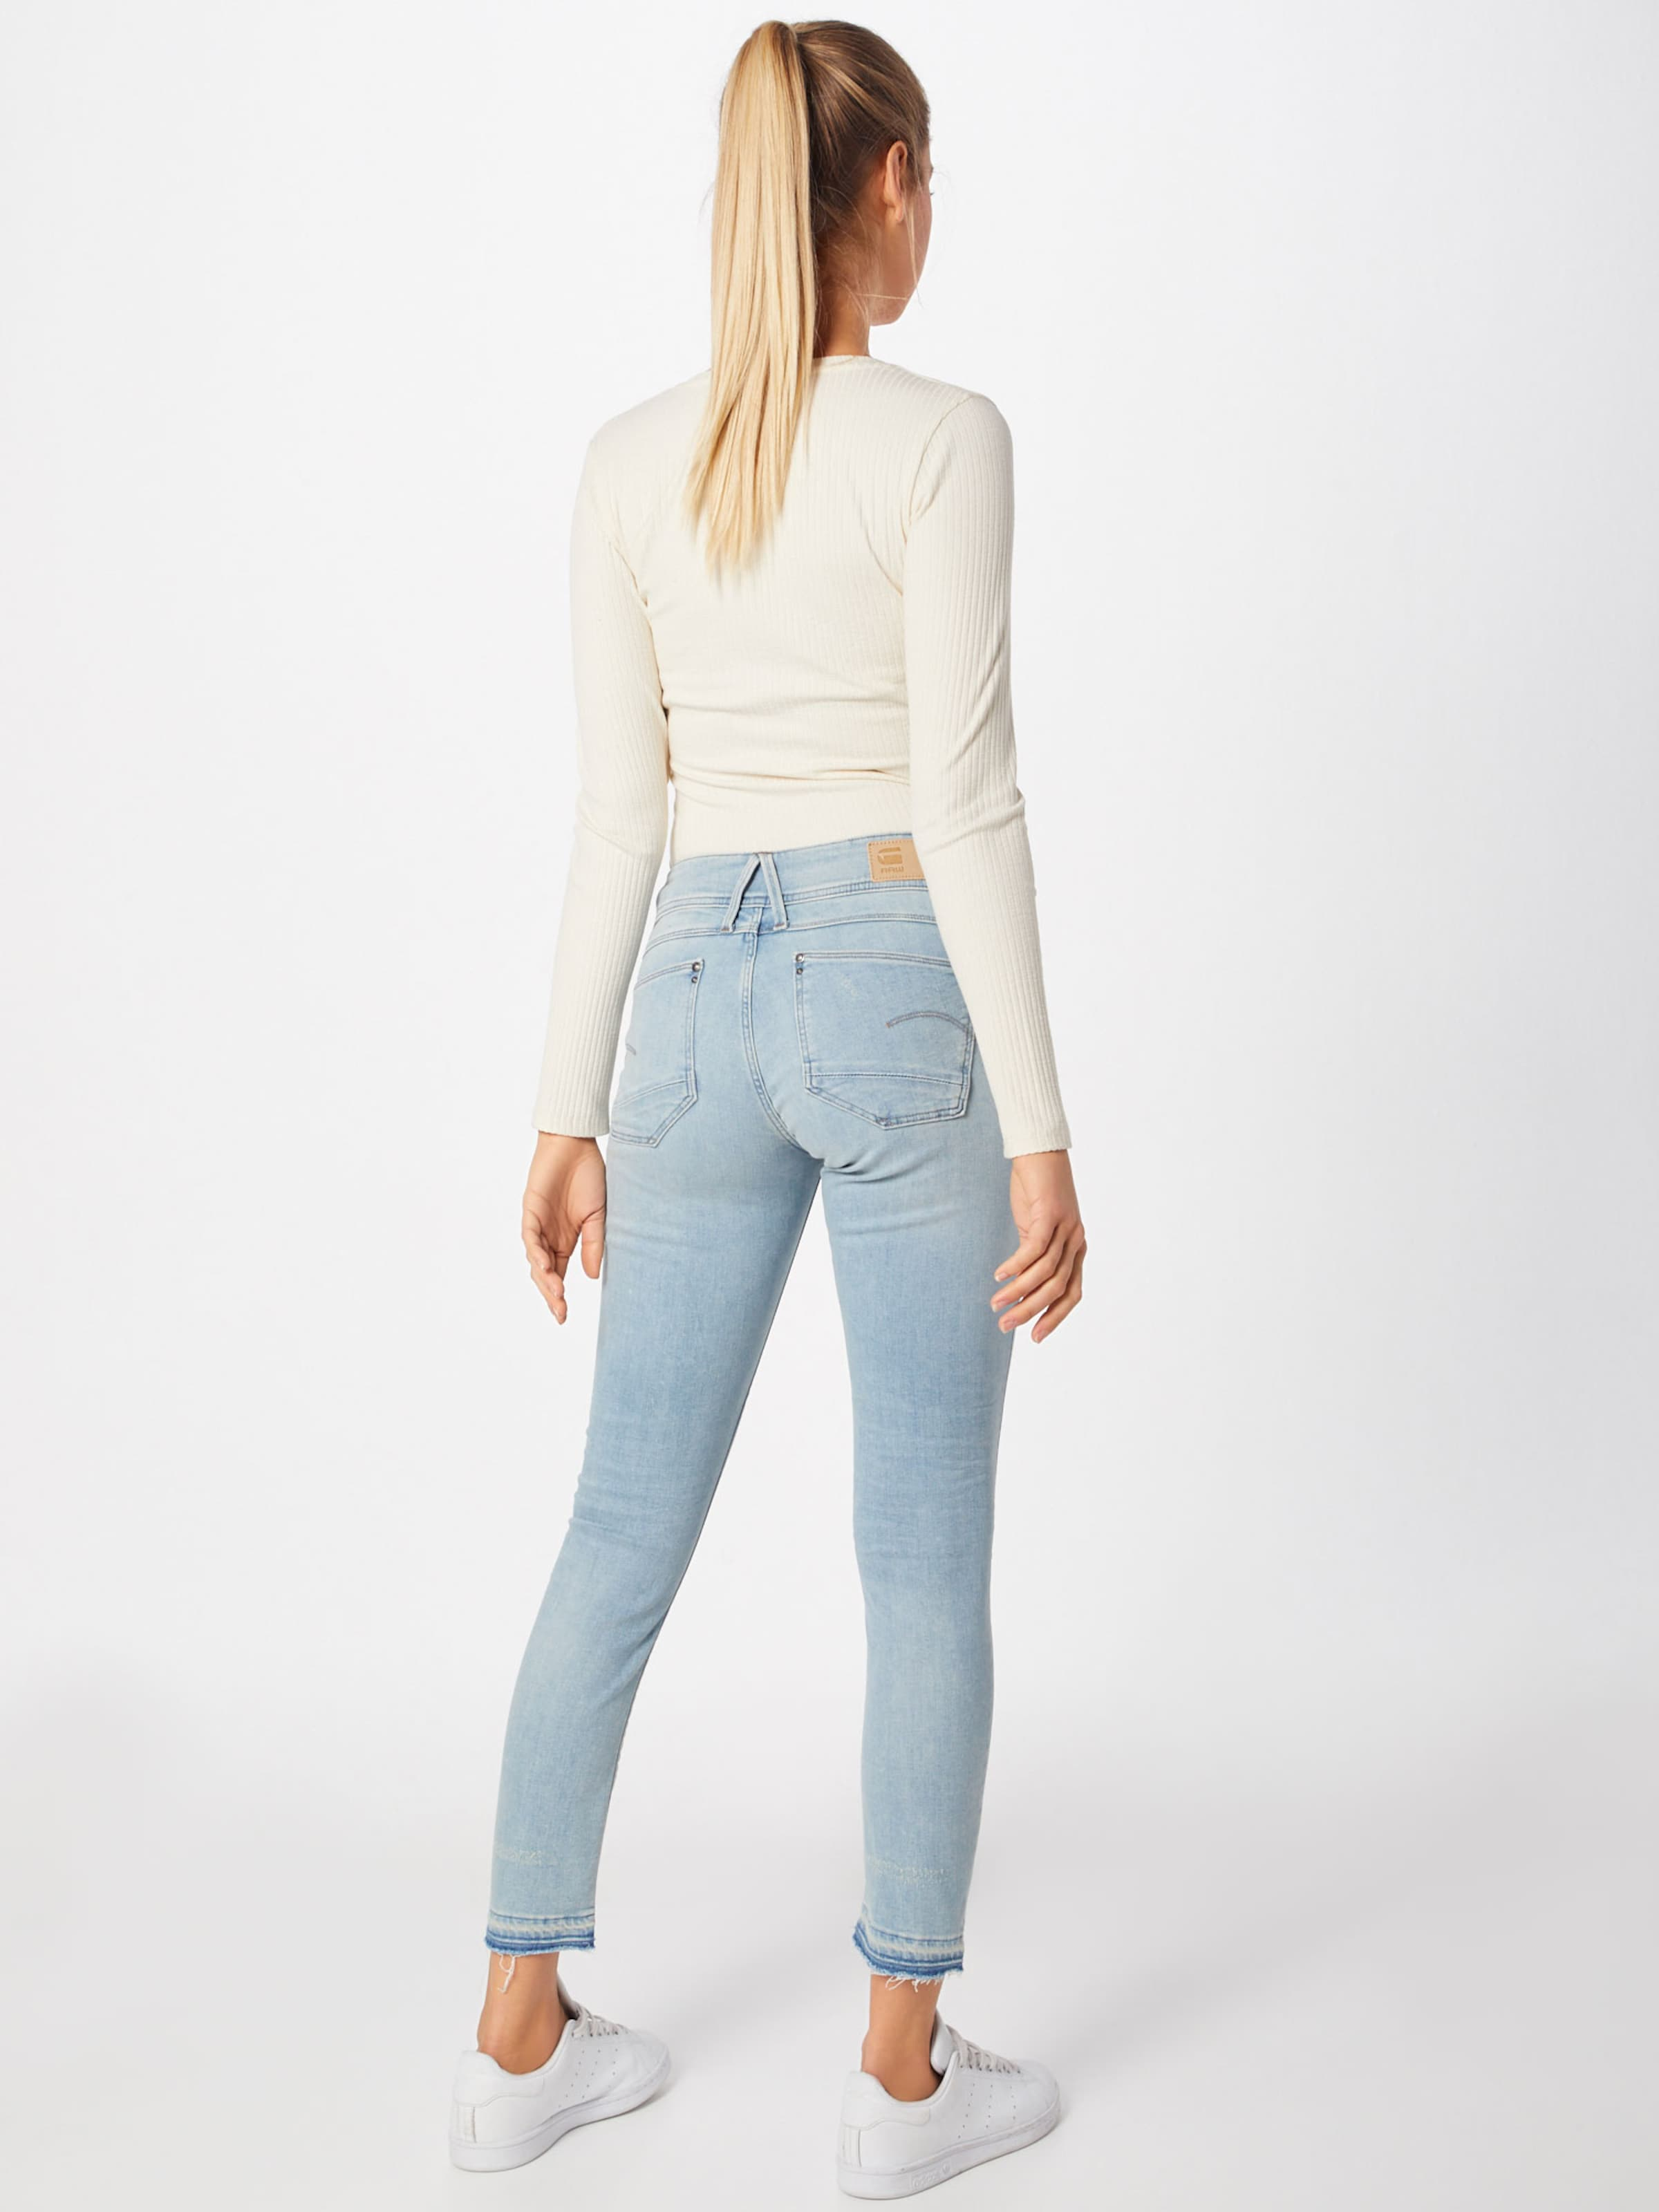 G star In Jeans Hellblau 'lynn' Raw Rc4ALS53jq